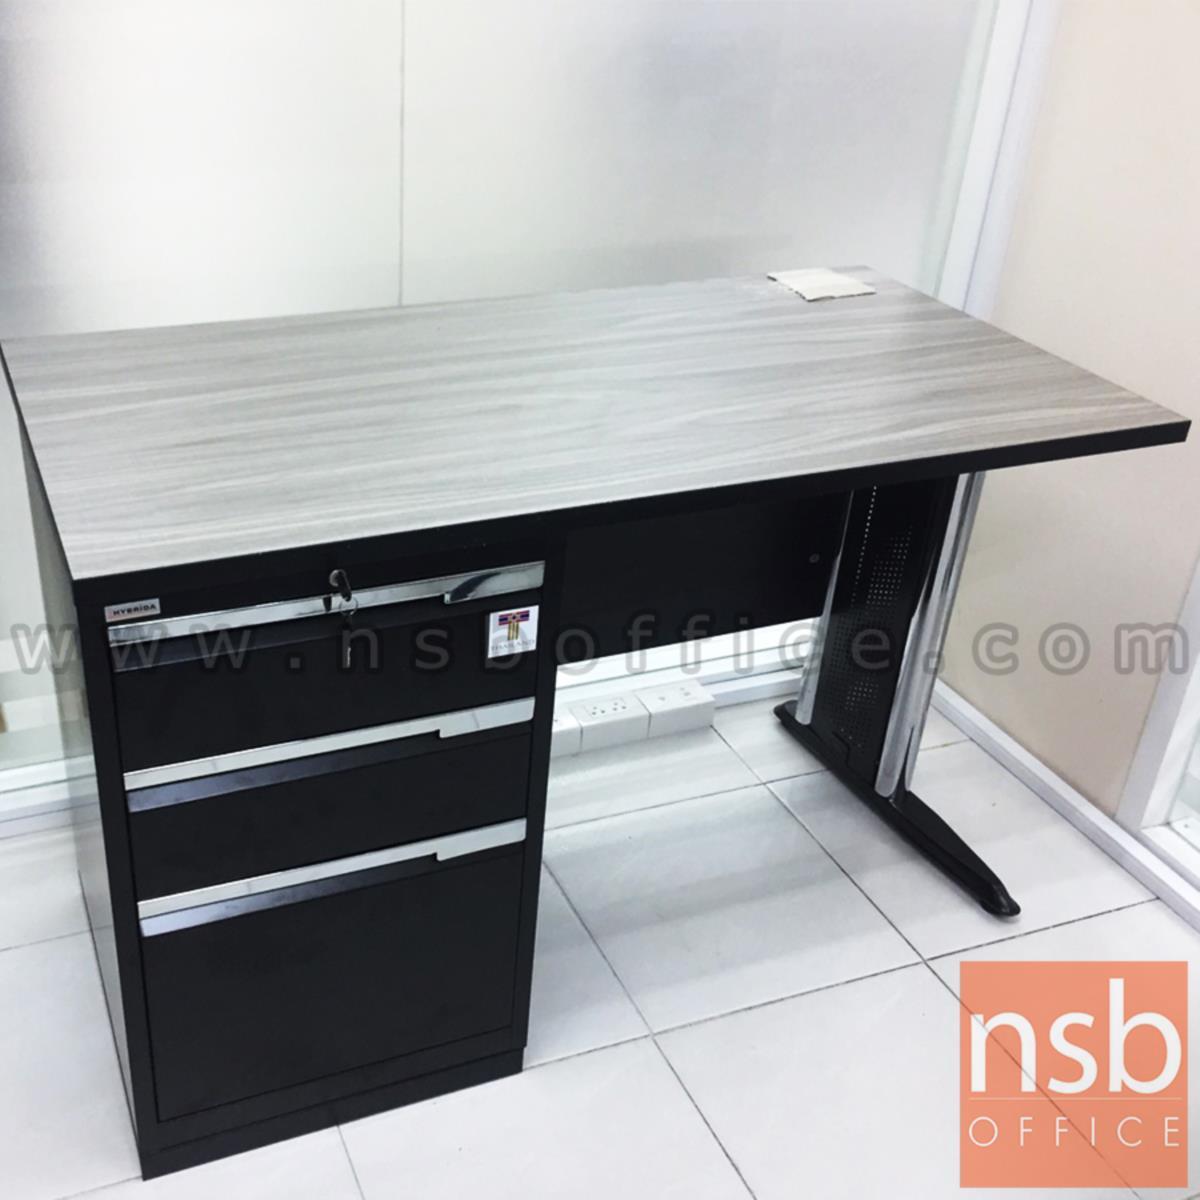 A18A050:โต๊ะทำงาน 3 ลิ้นชัก มีบังโป๊  ขนาด 120W ,135W ,150W ,180W cm. ขาเหล็ก